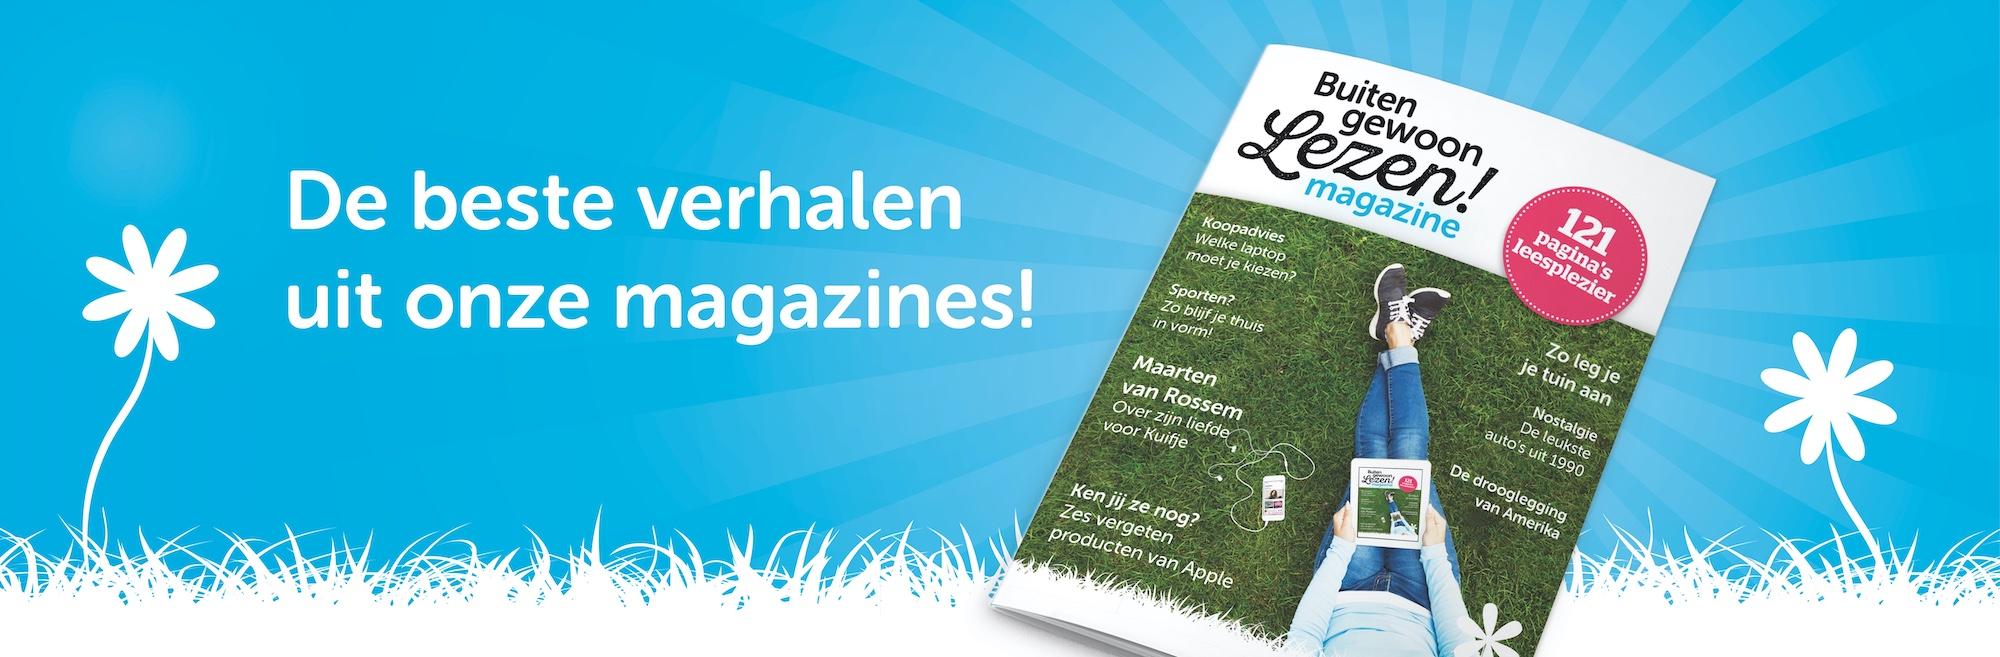 Buiten gewoon Lezen! magazine